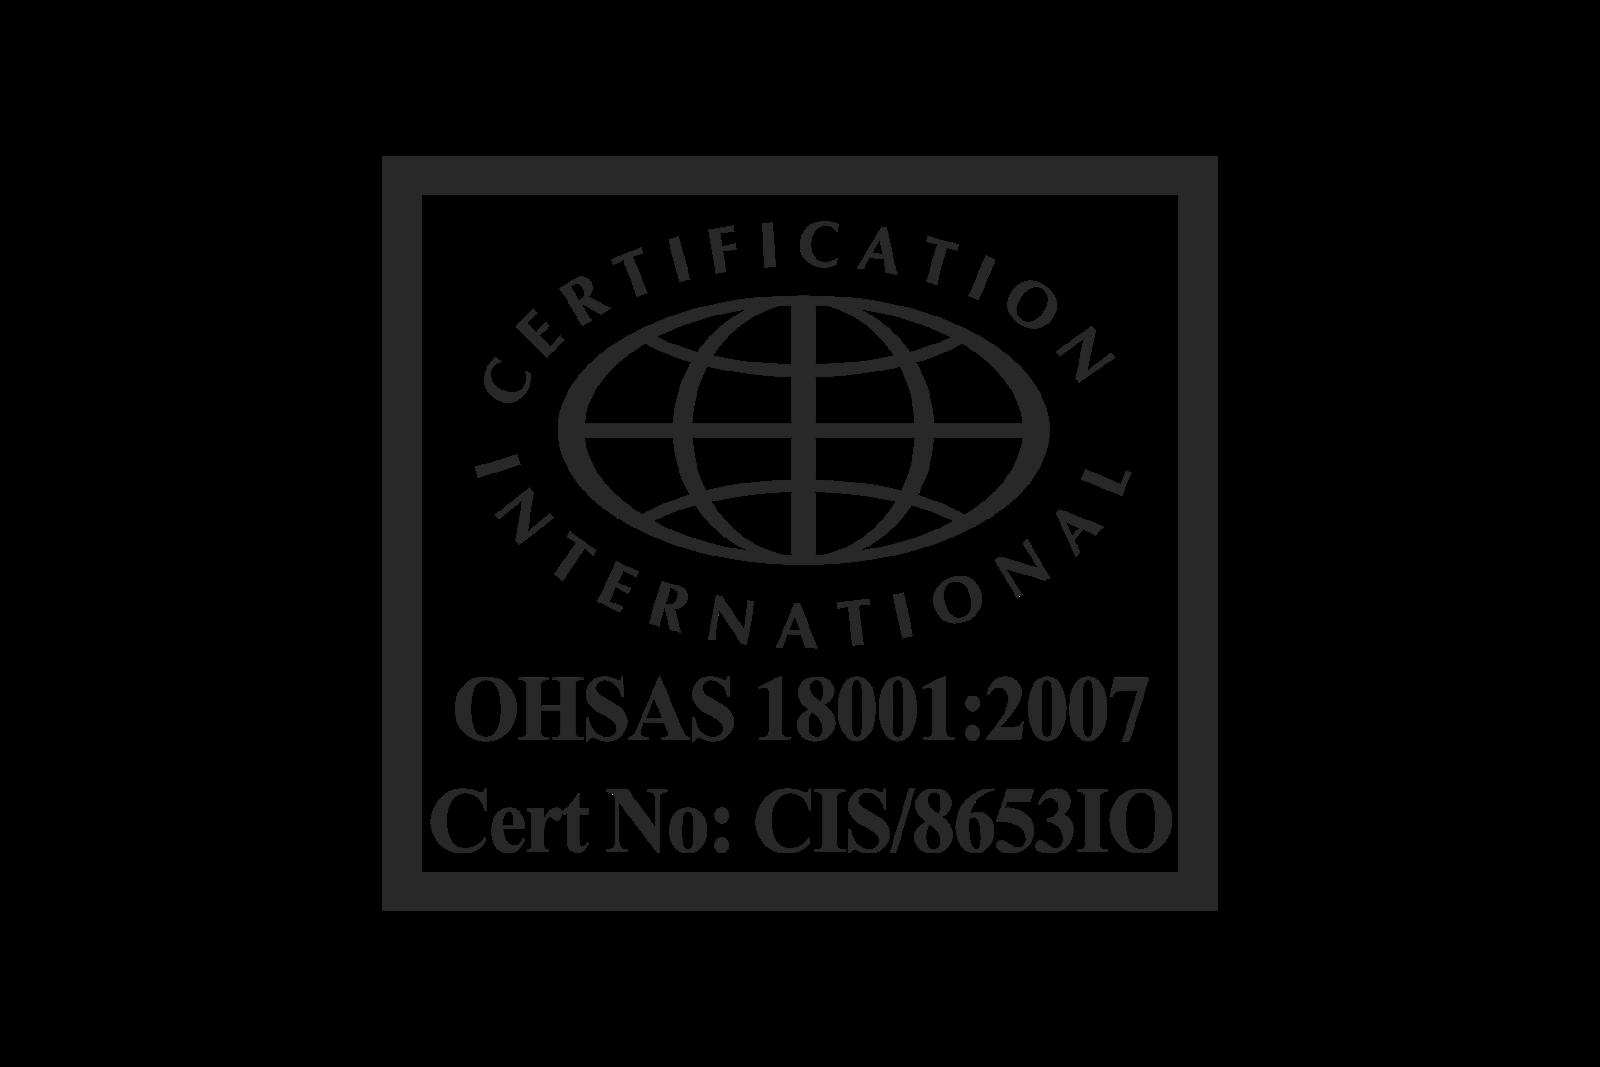 ohsas 180012007 certification logo